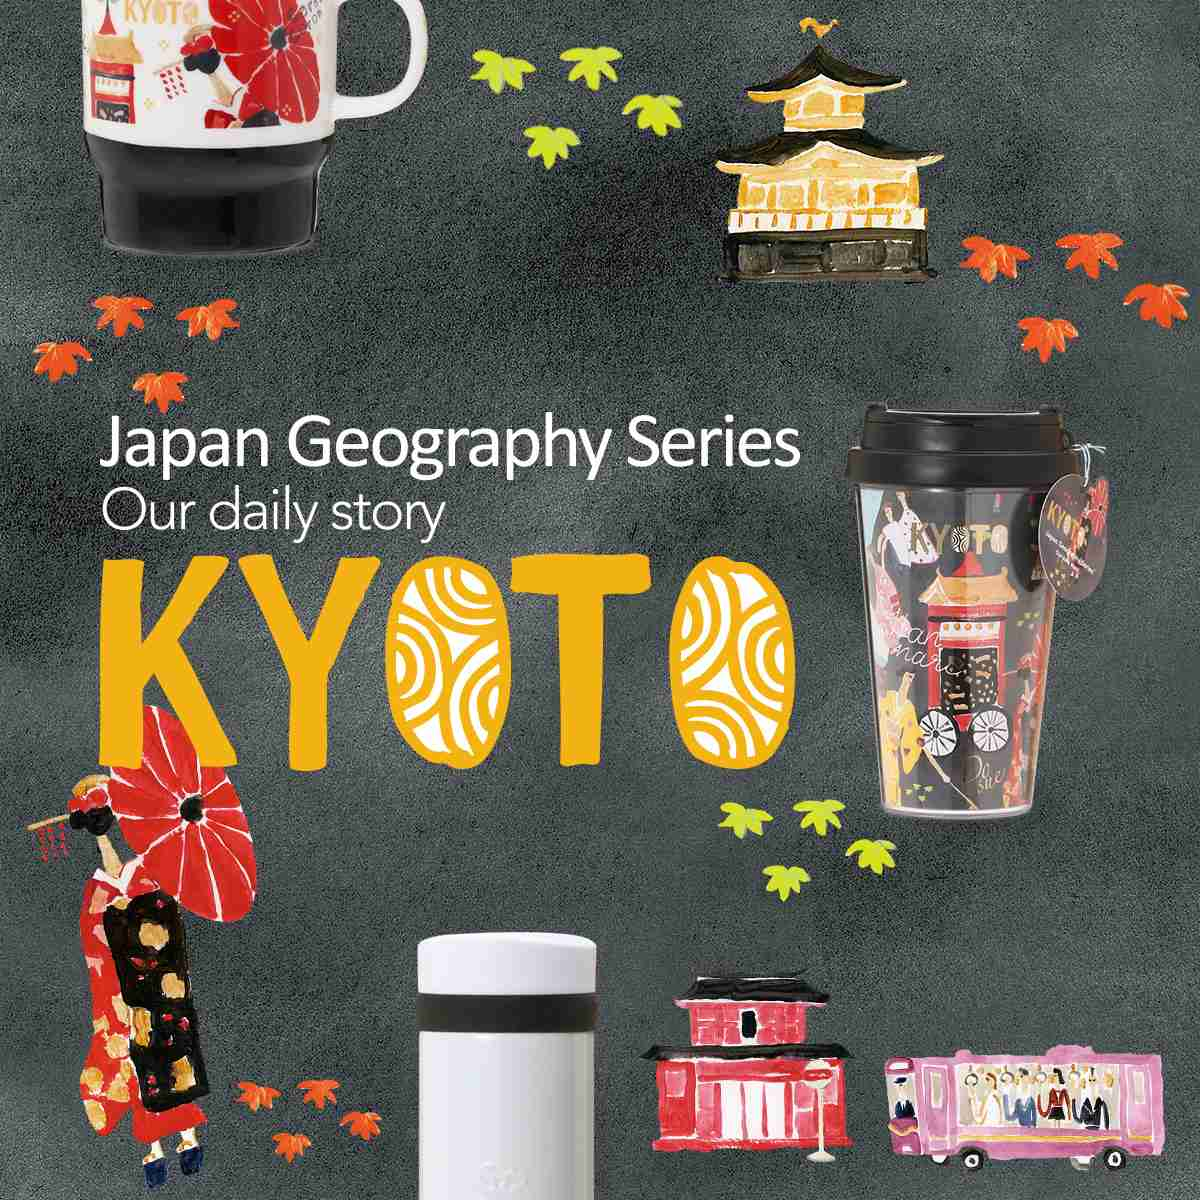 Japan Geography Series 京都|スターバックス コーヒー ジャパン